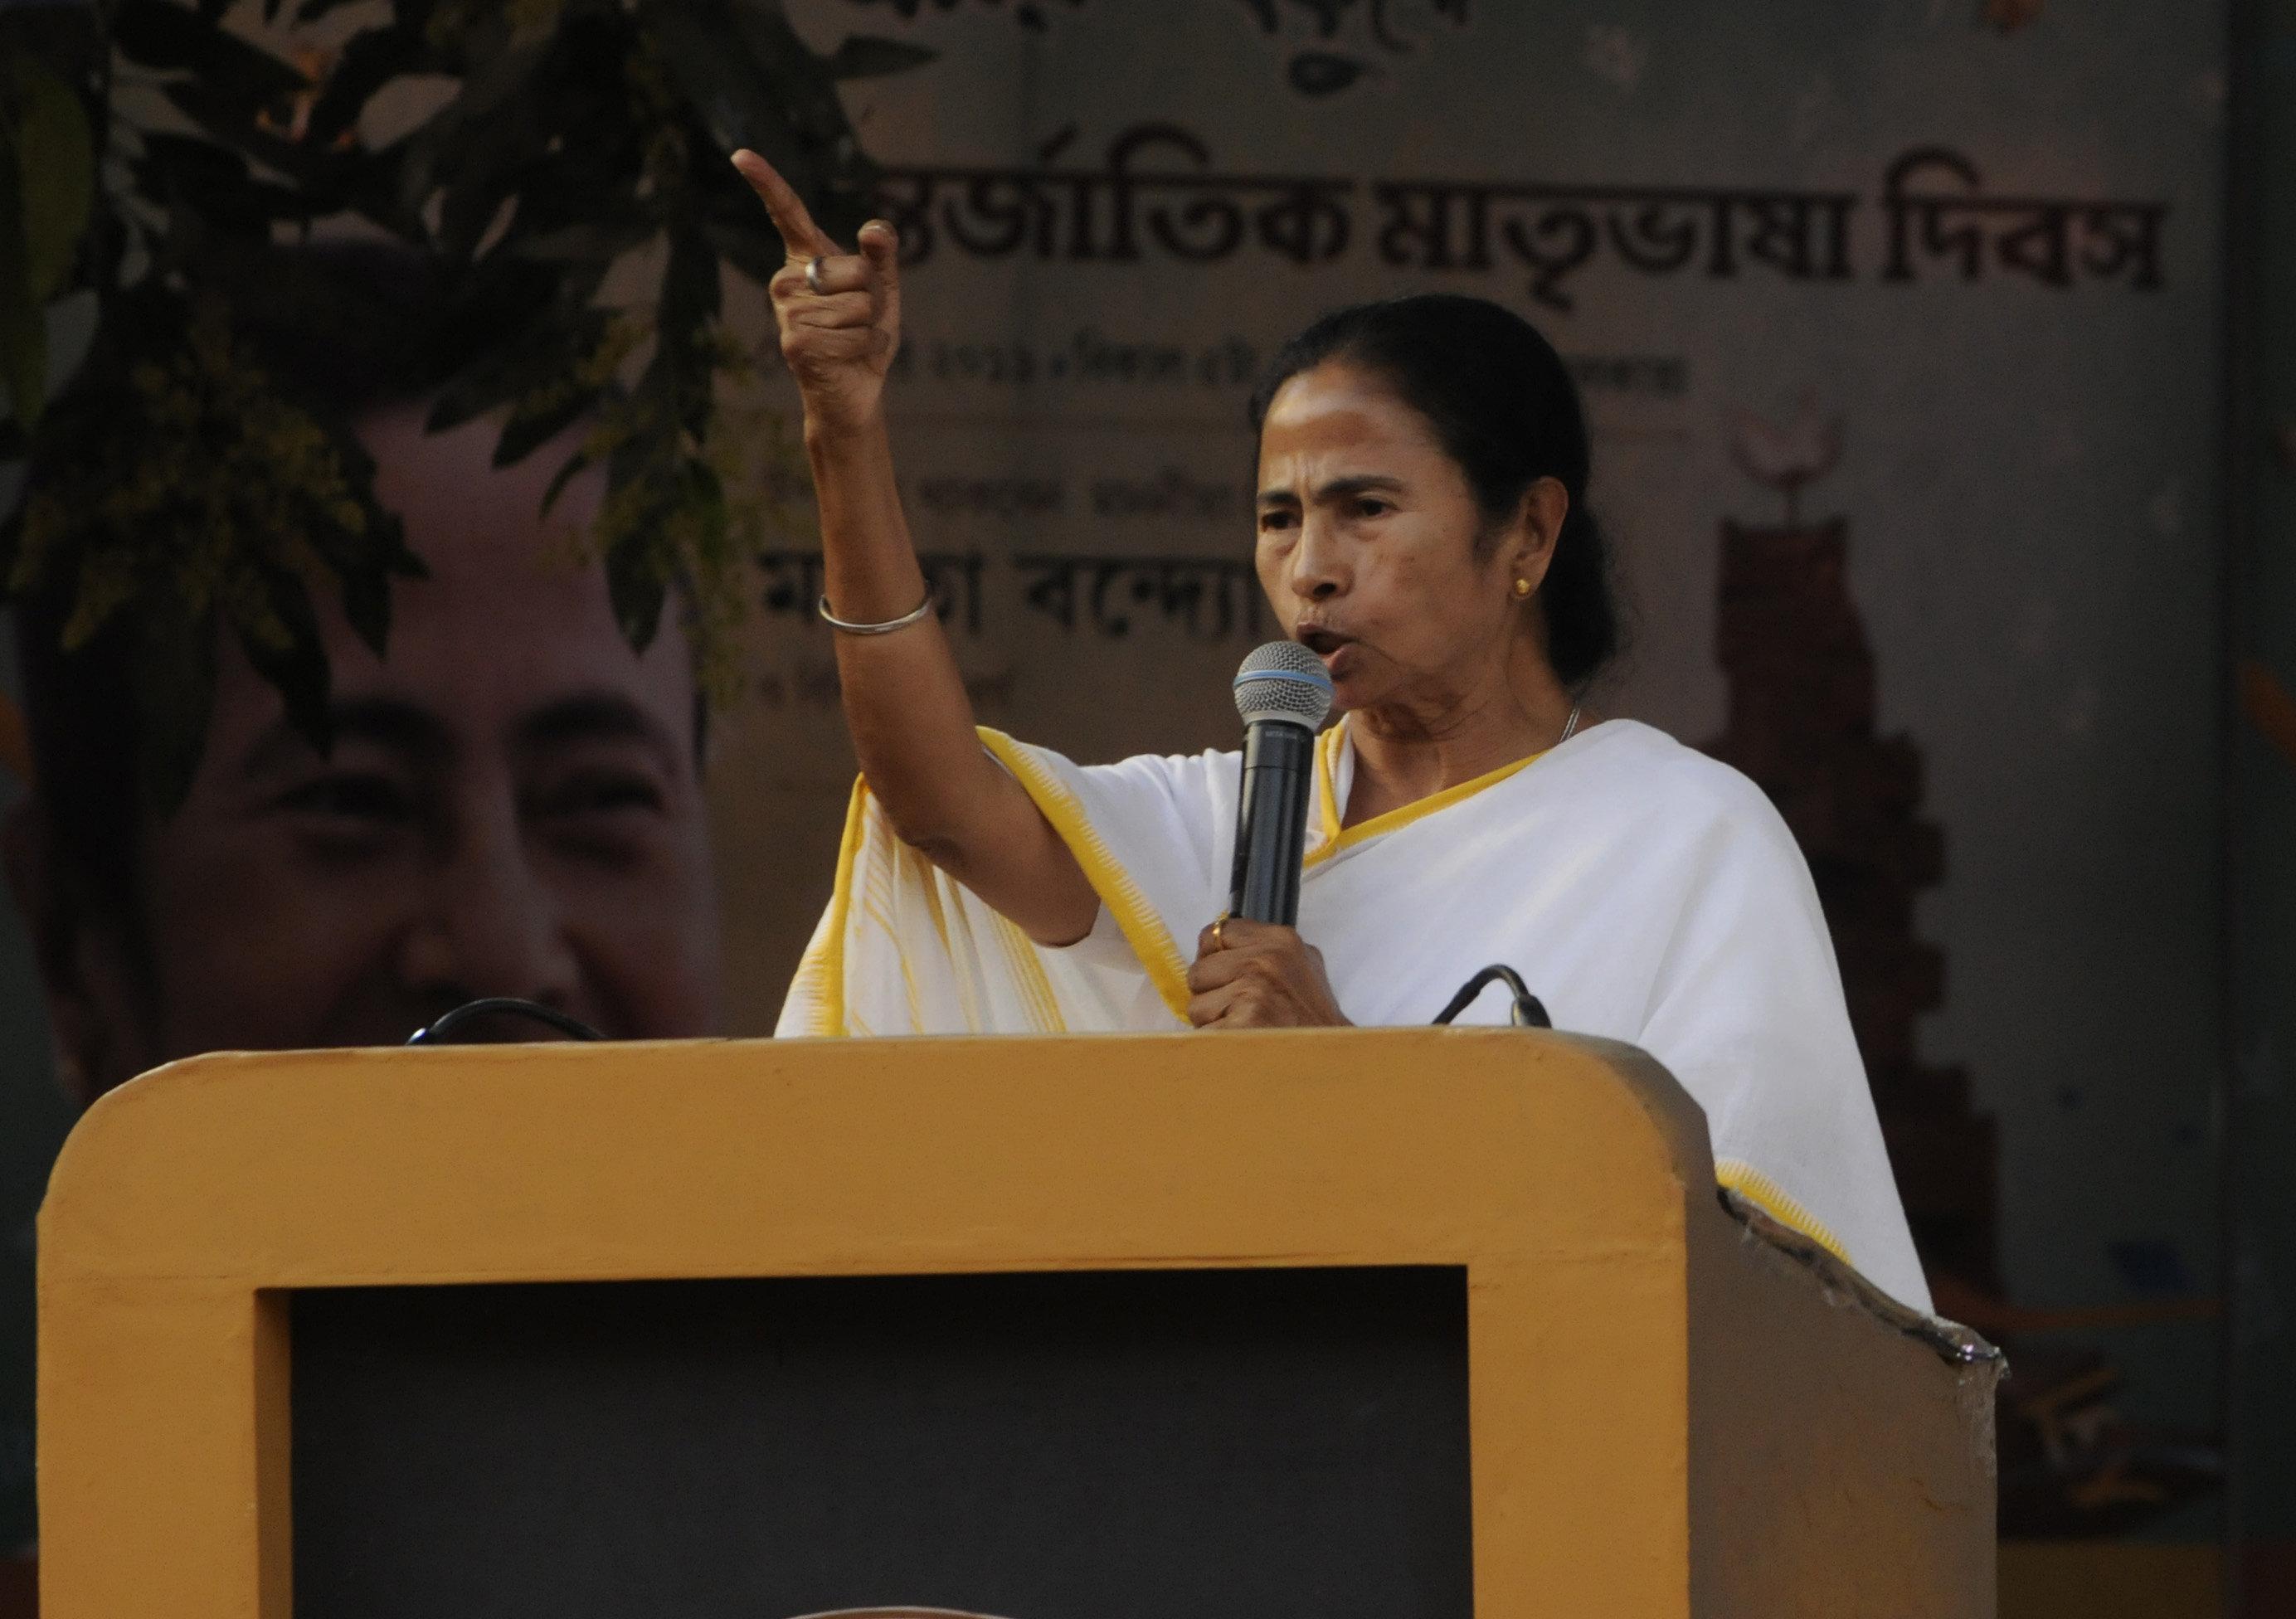 Retired IPS Blames Mamata Banerjee In Suicide Note, TMC Calls Allegation